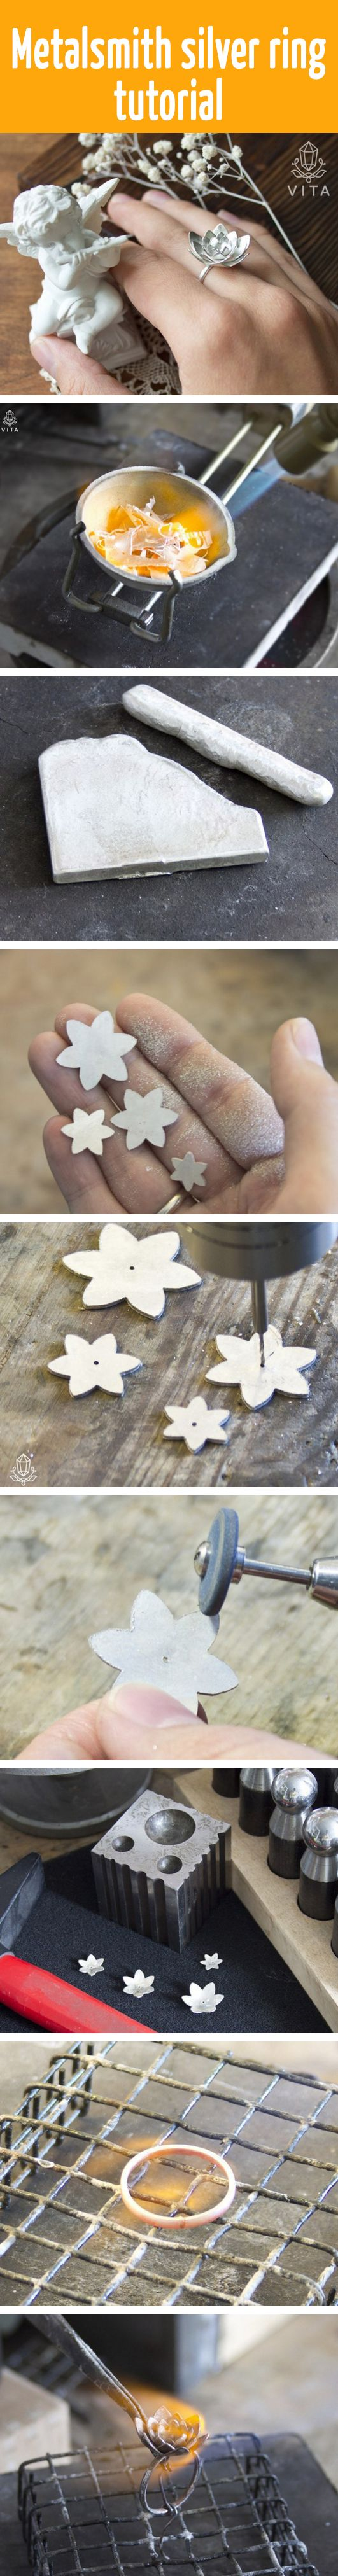 Metalsmith silver ring tutorial - Tutorial: anello a fiore in argento